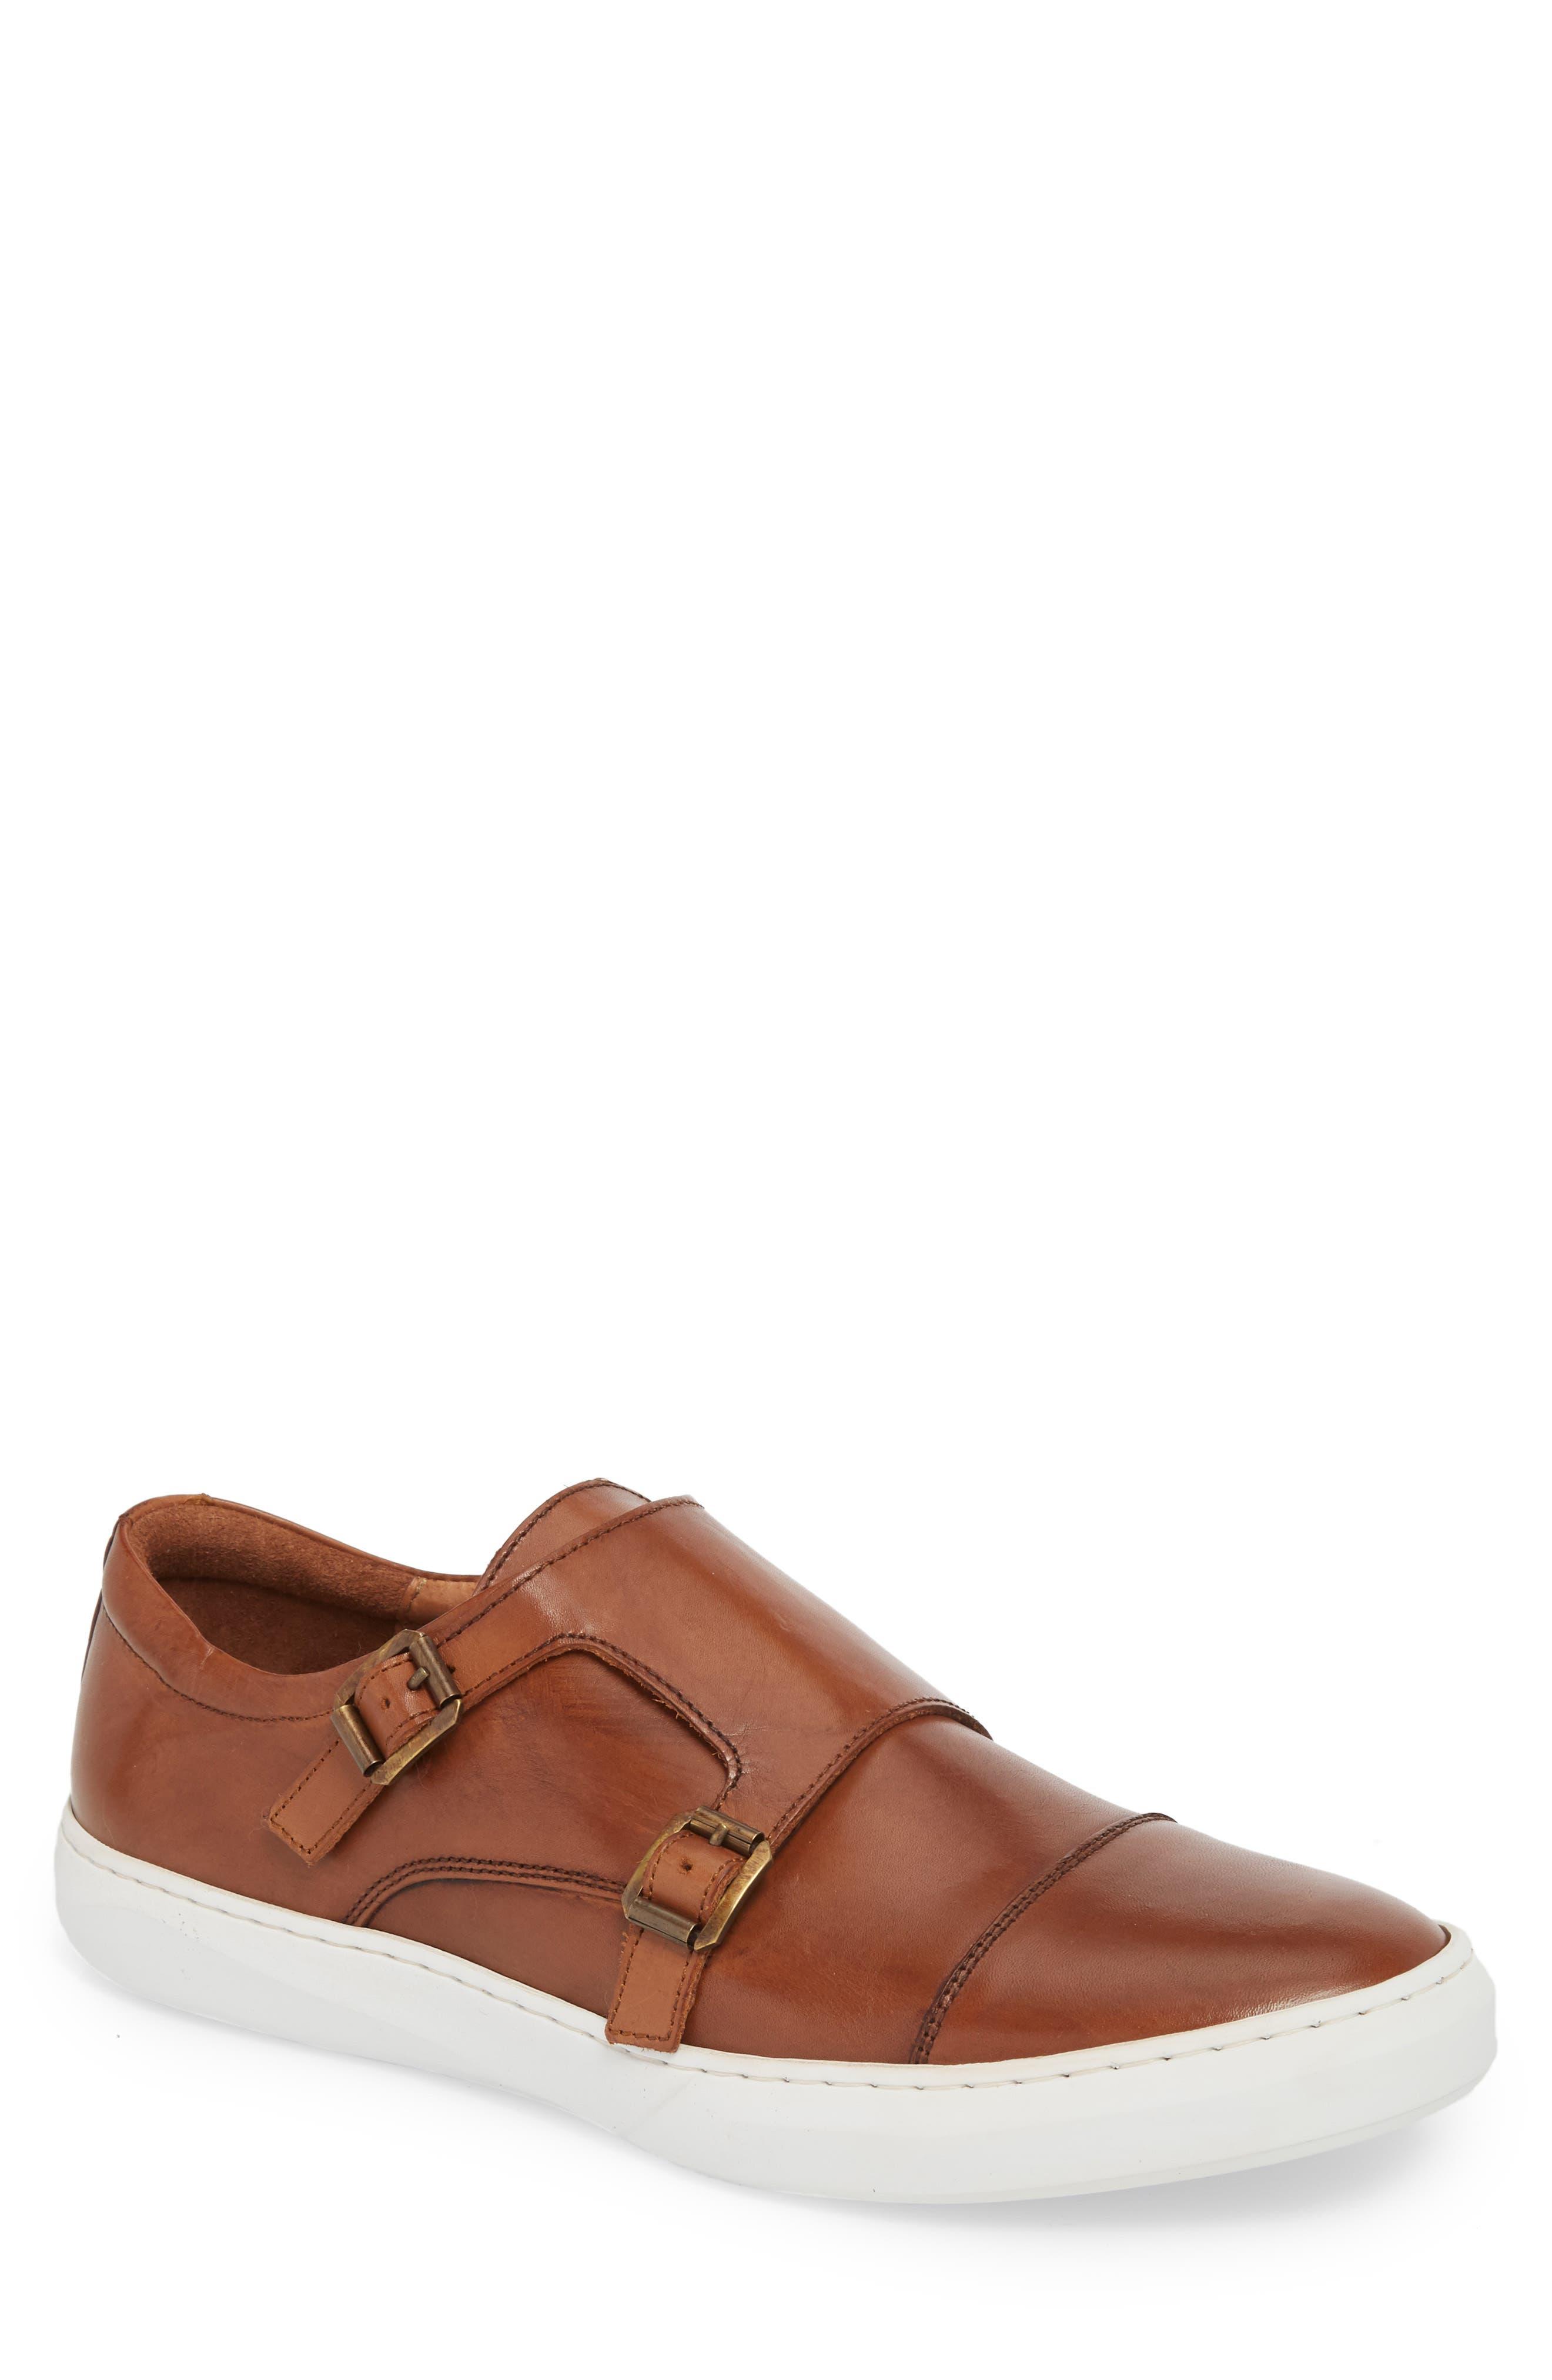 Whyle Double Strap Monk Sneaker,                         Main,                         color, Cognac Leather